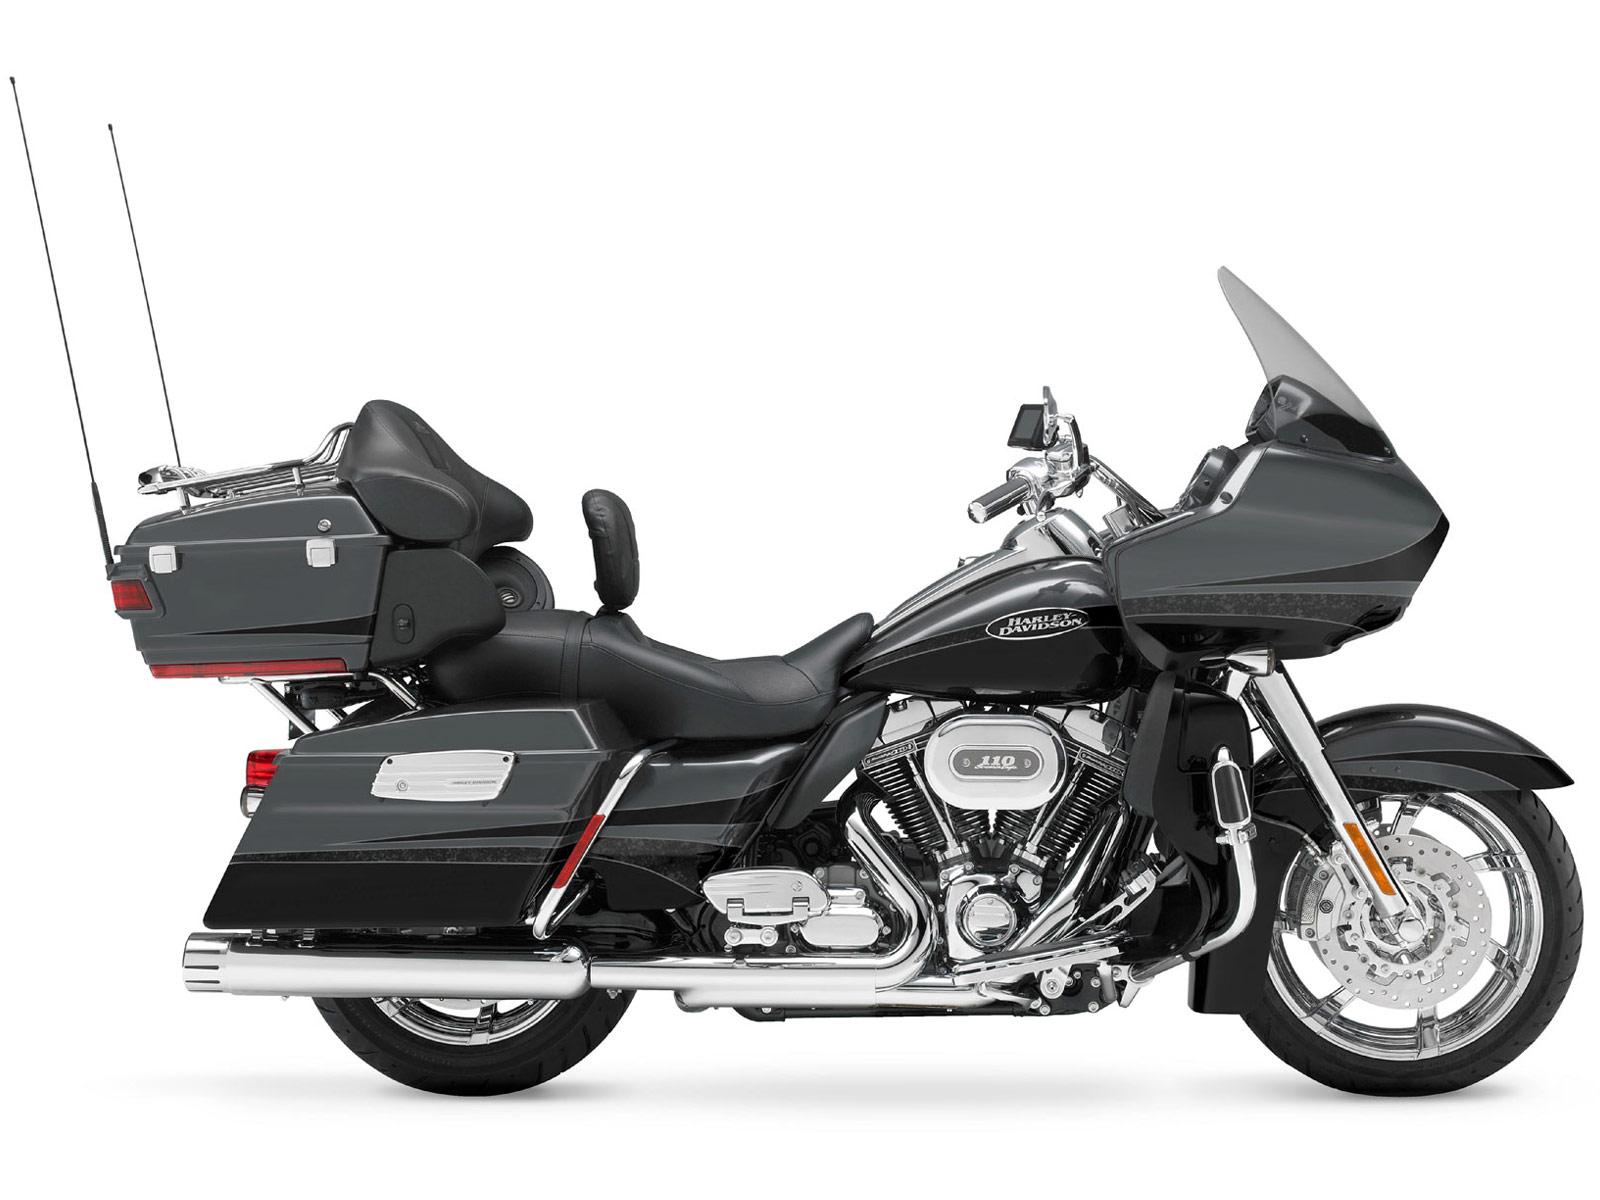 2011 Harley CVO Road Glide Ultra